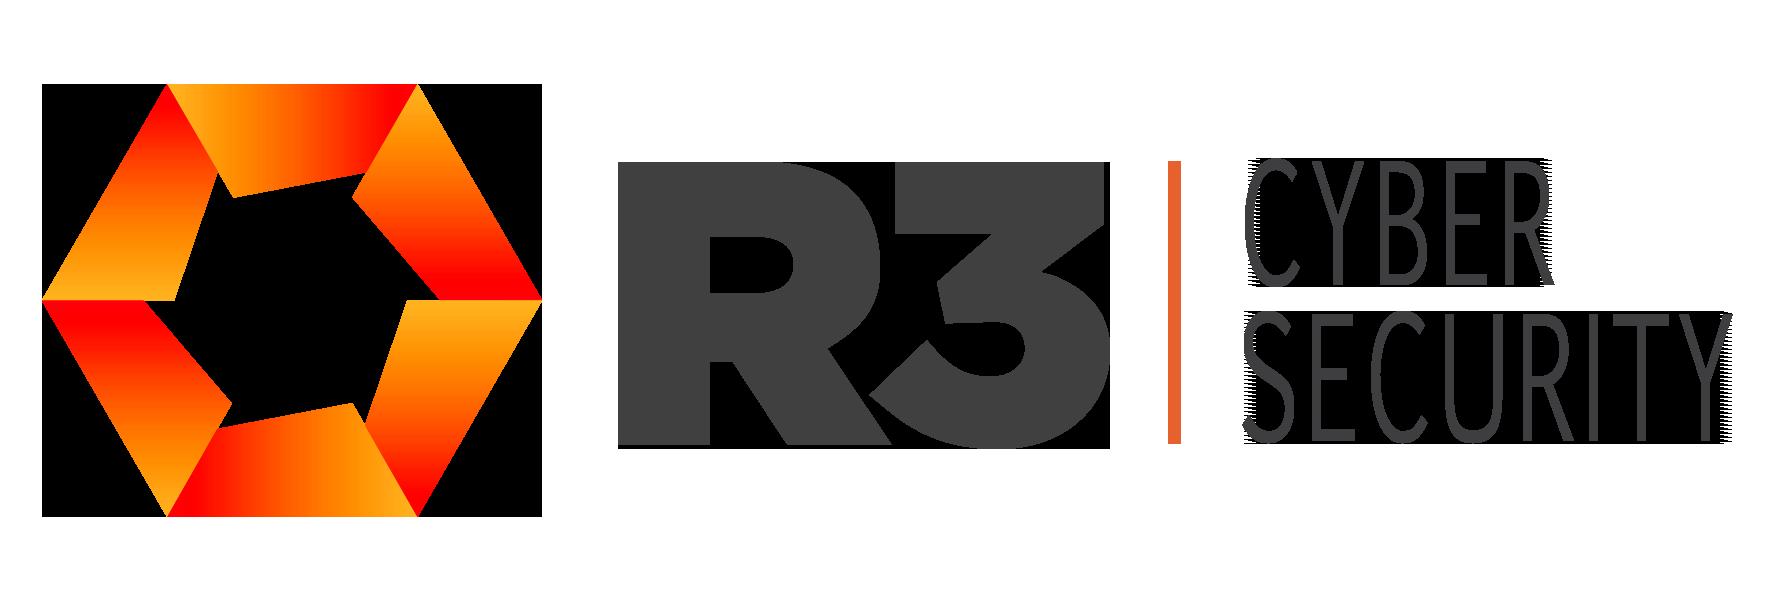 R3-logo_2017